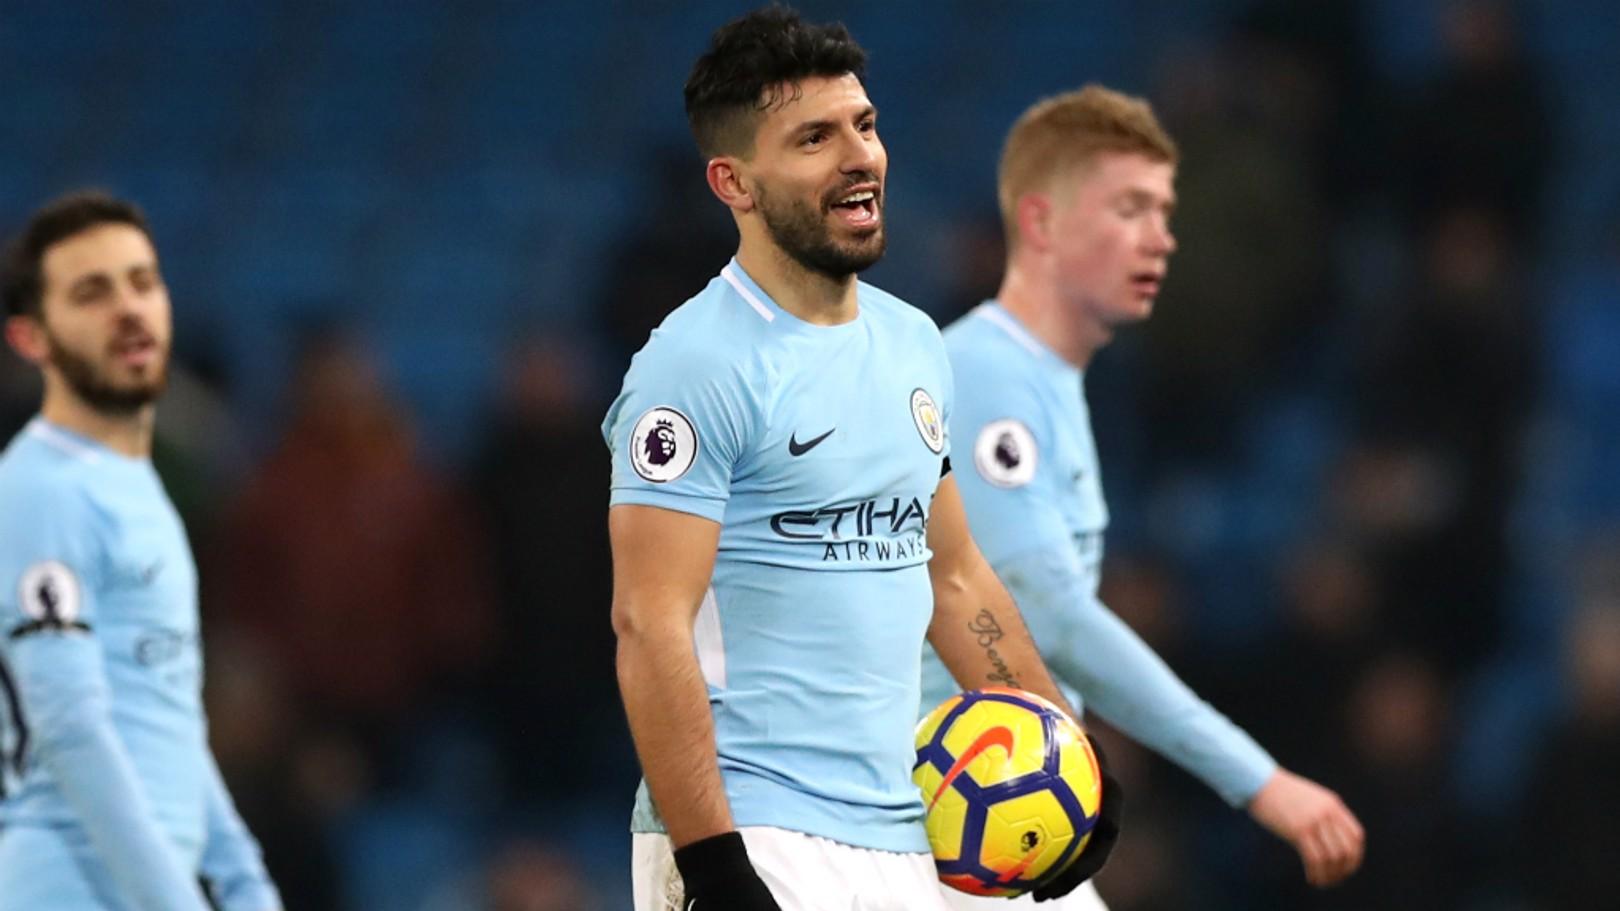 HAT-TRICK HERO: Sergio Aguero proudly grabs his match ball